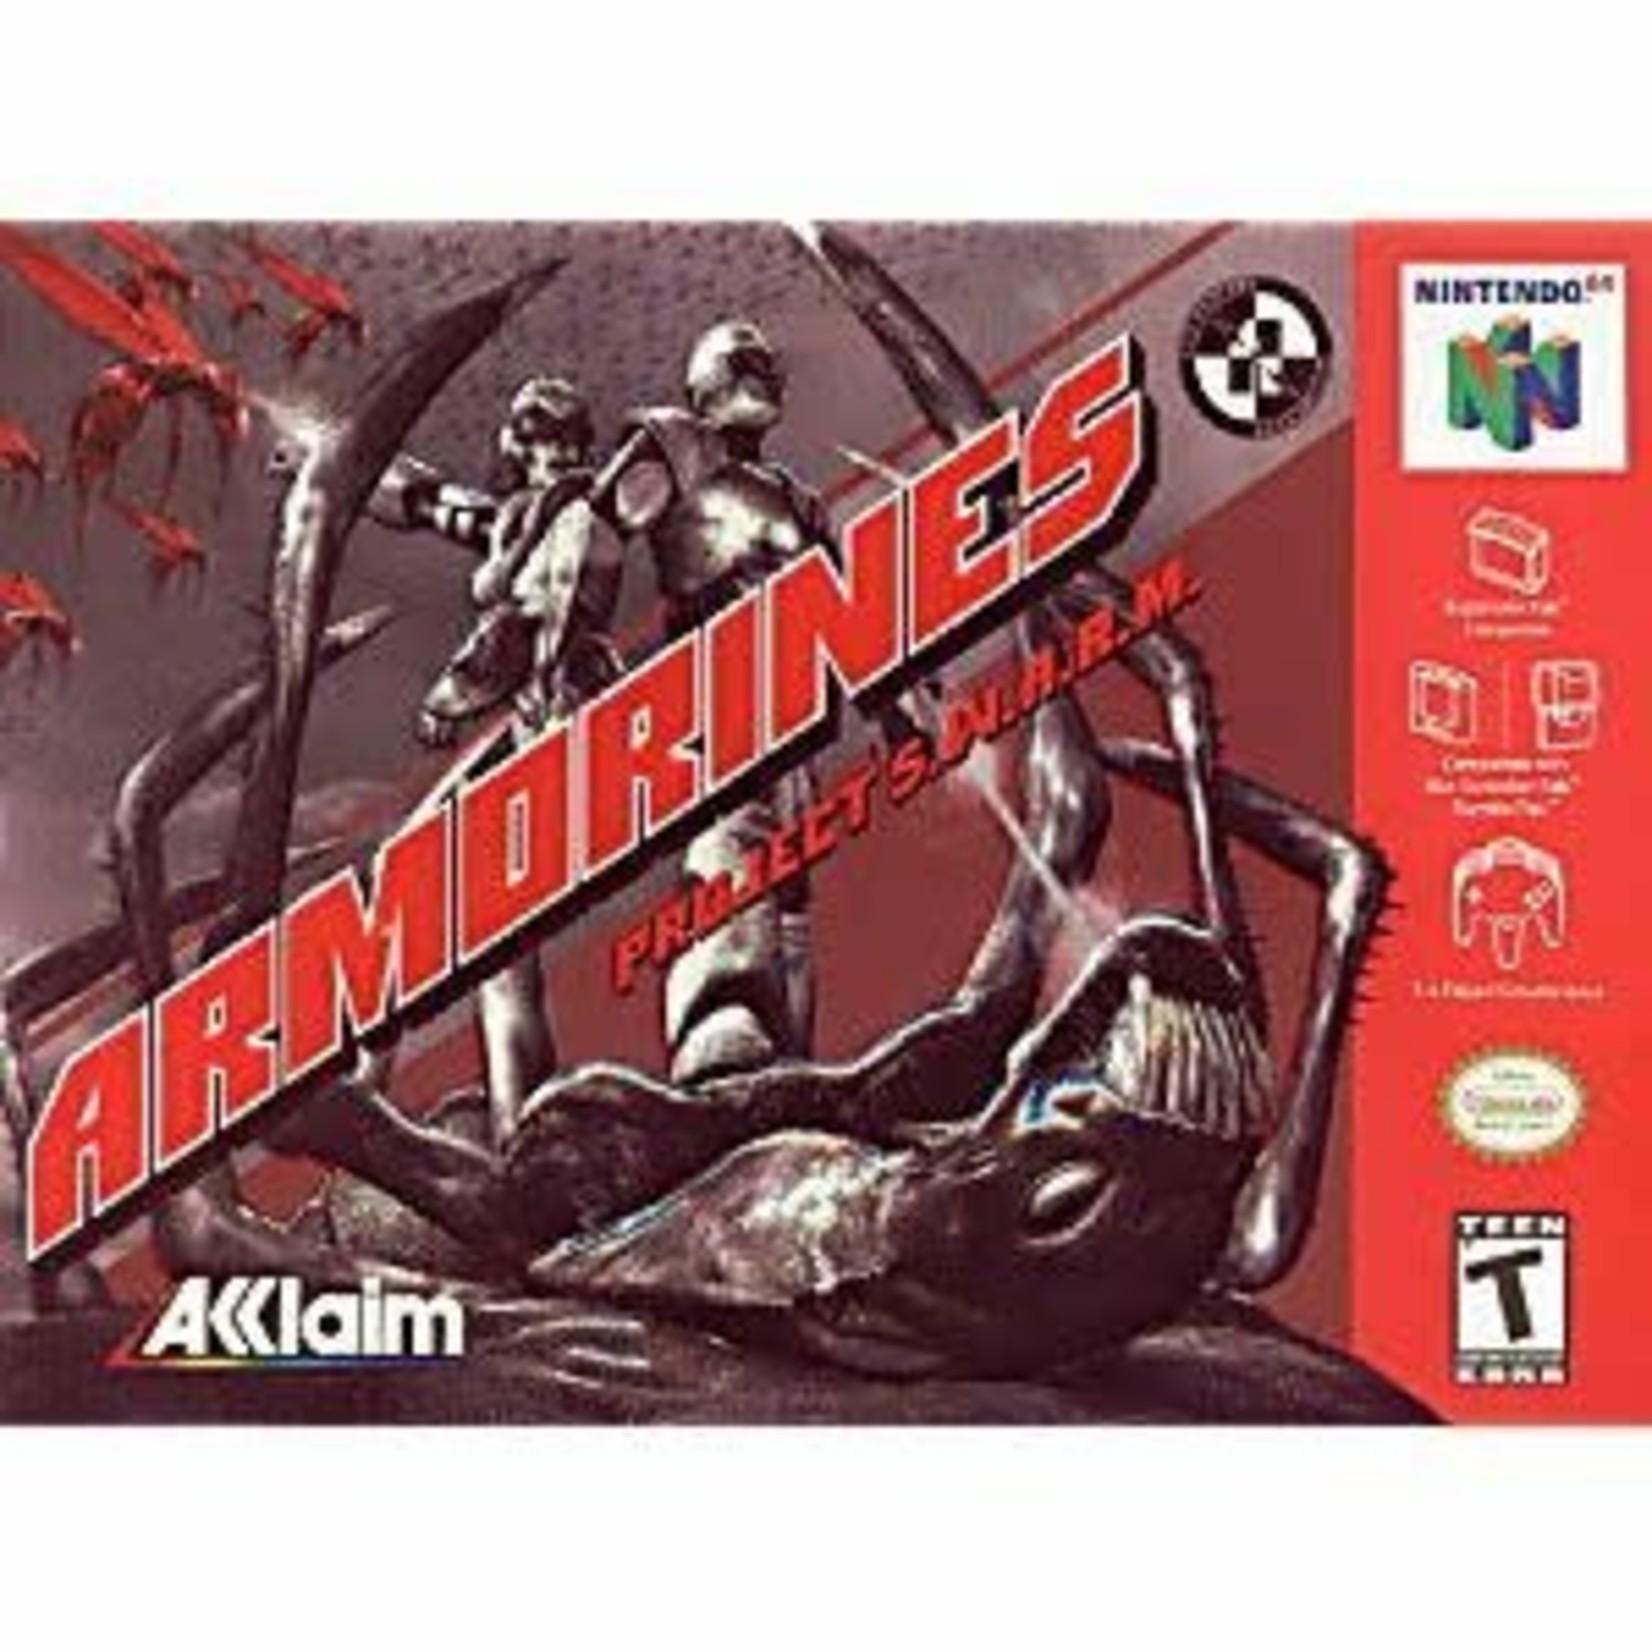 n64u-Armorines Project Swarm (cartridge)